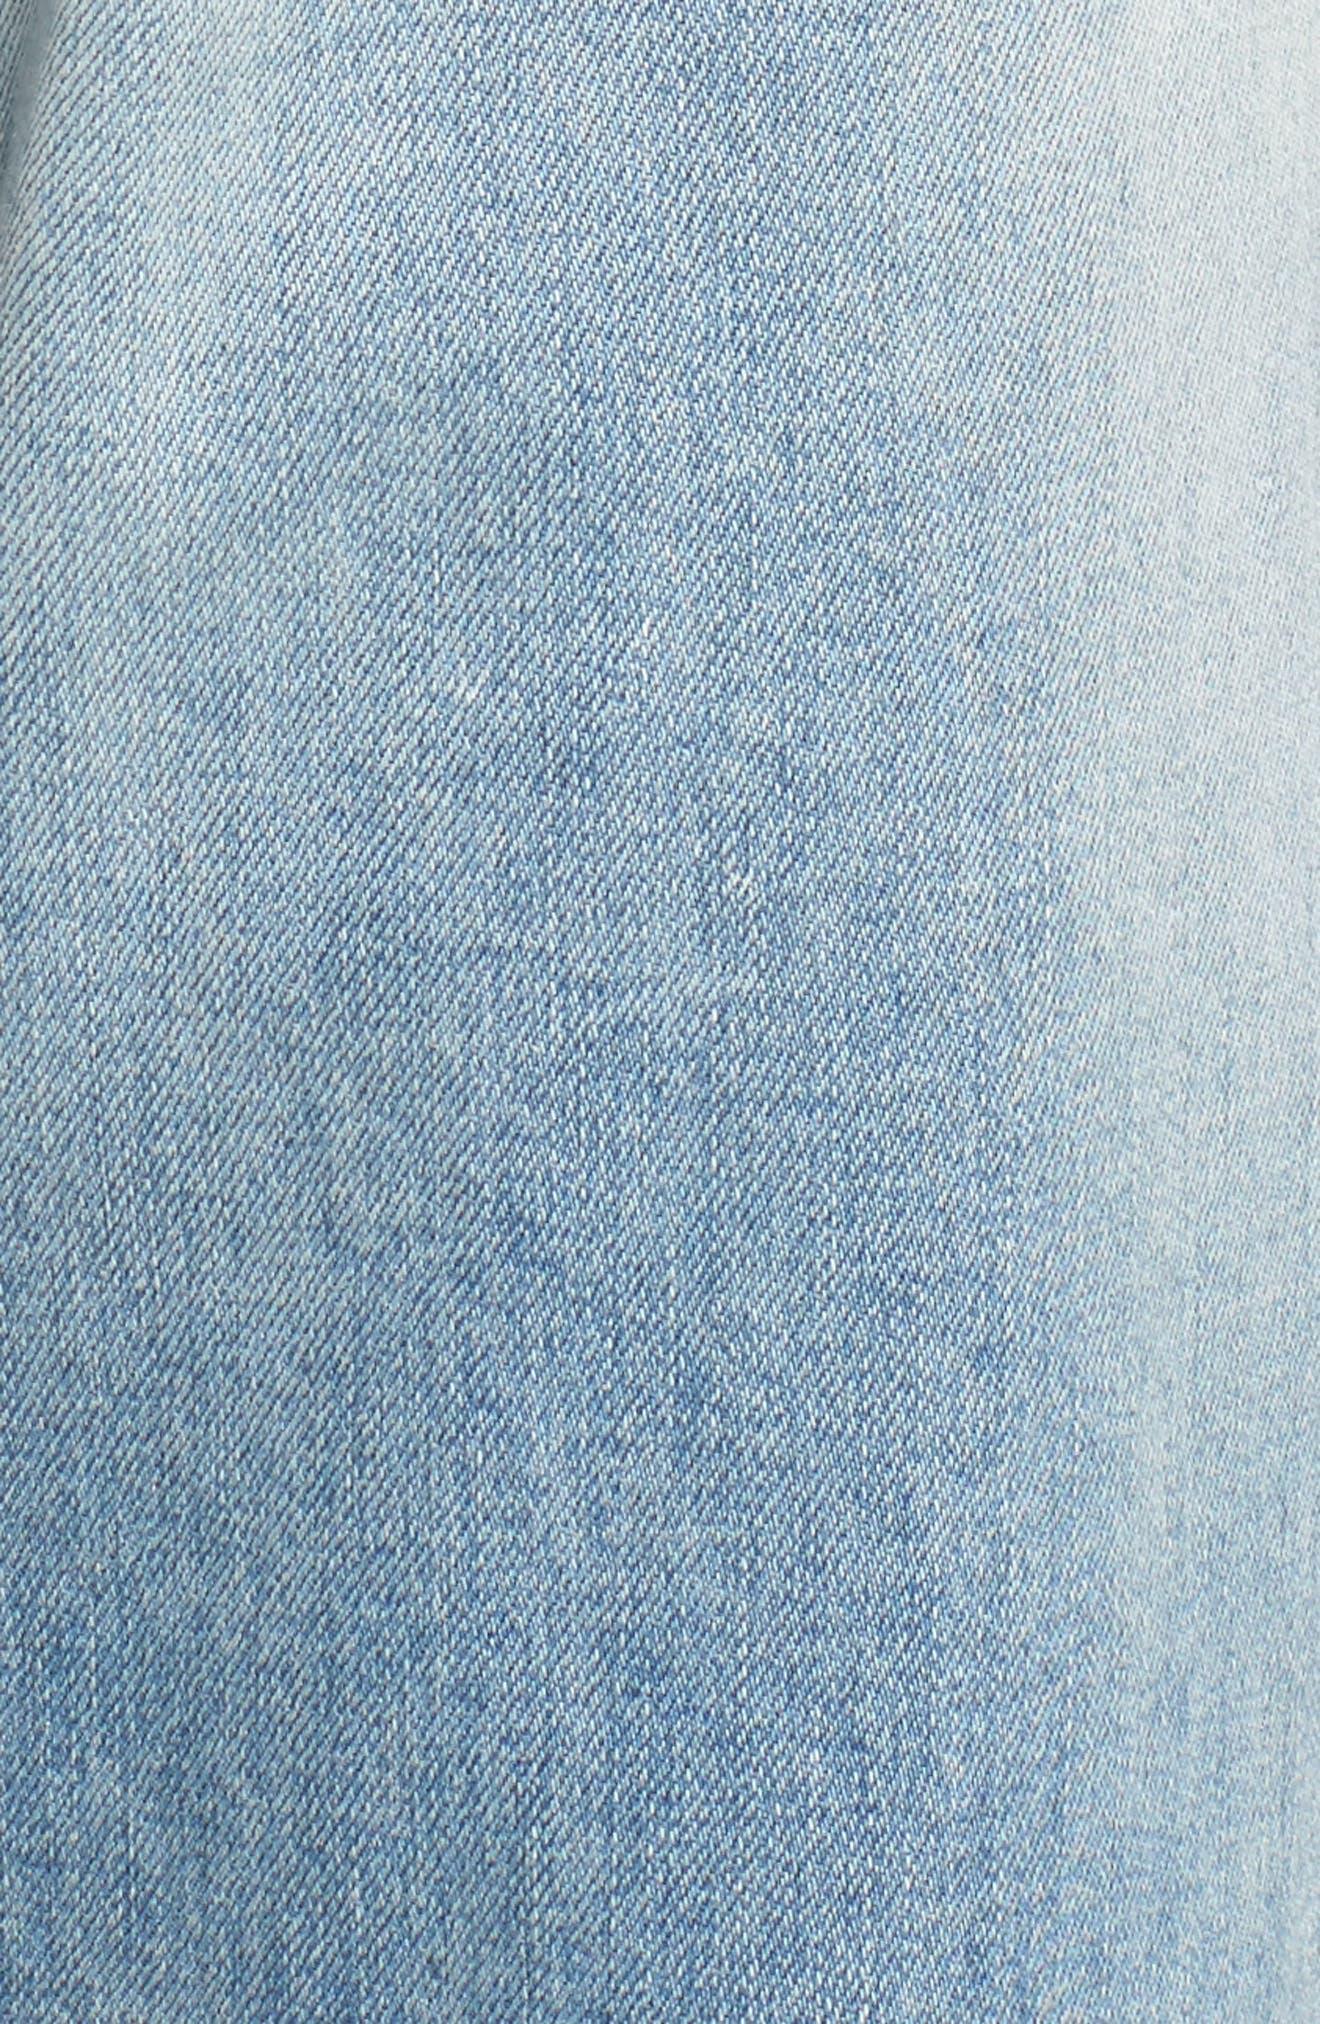 TREASURE & BOND,                             Boyfriend Jeans,                             Alternate thumbnail 5, color,                             400